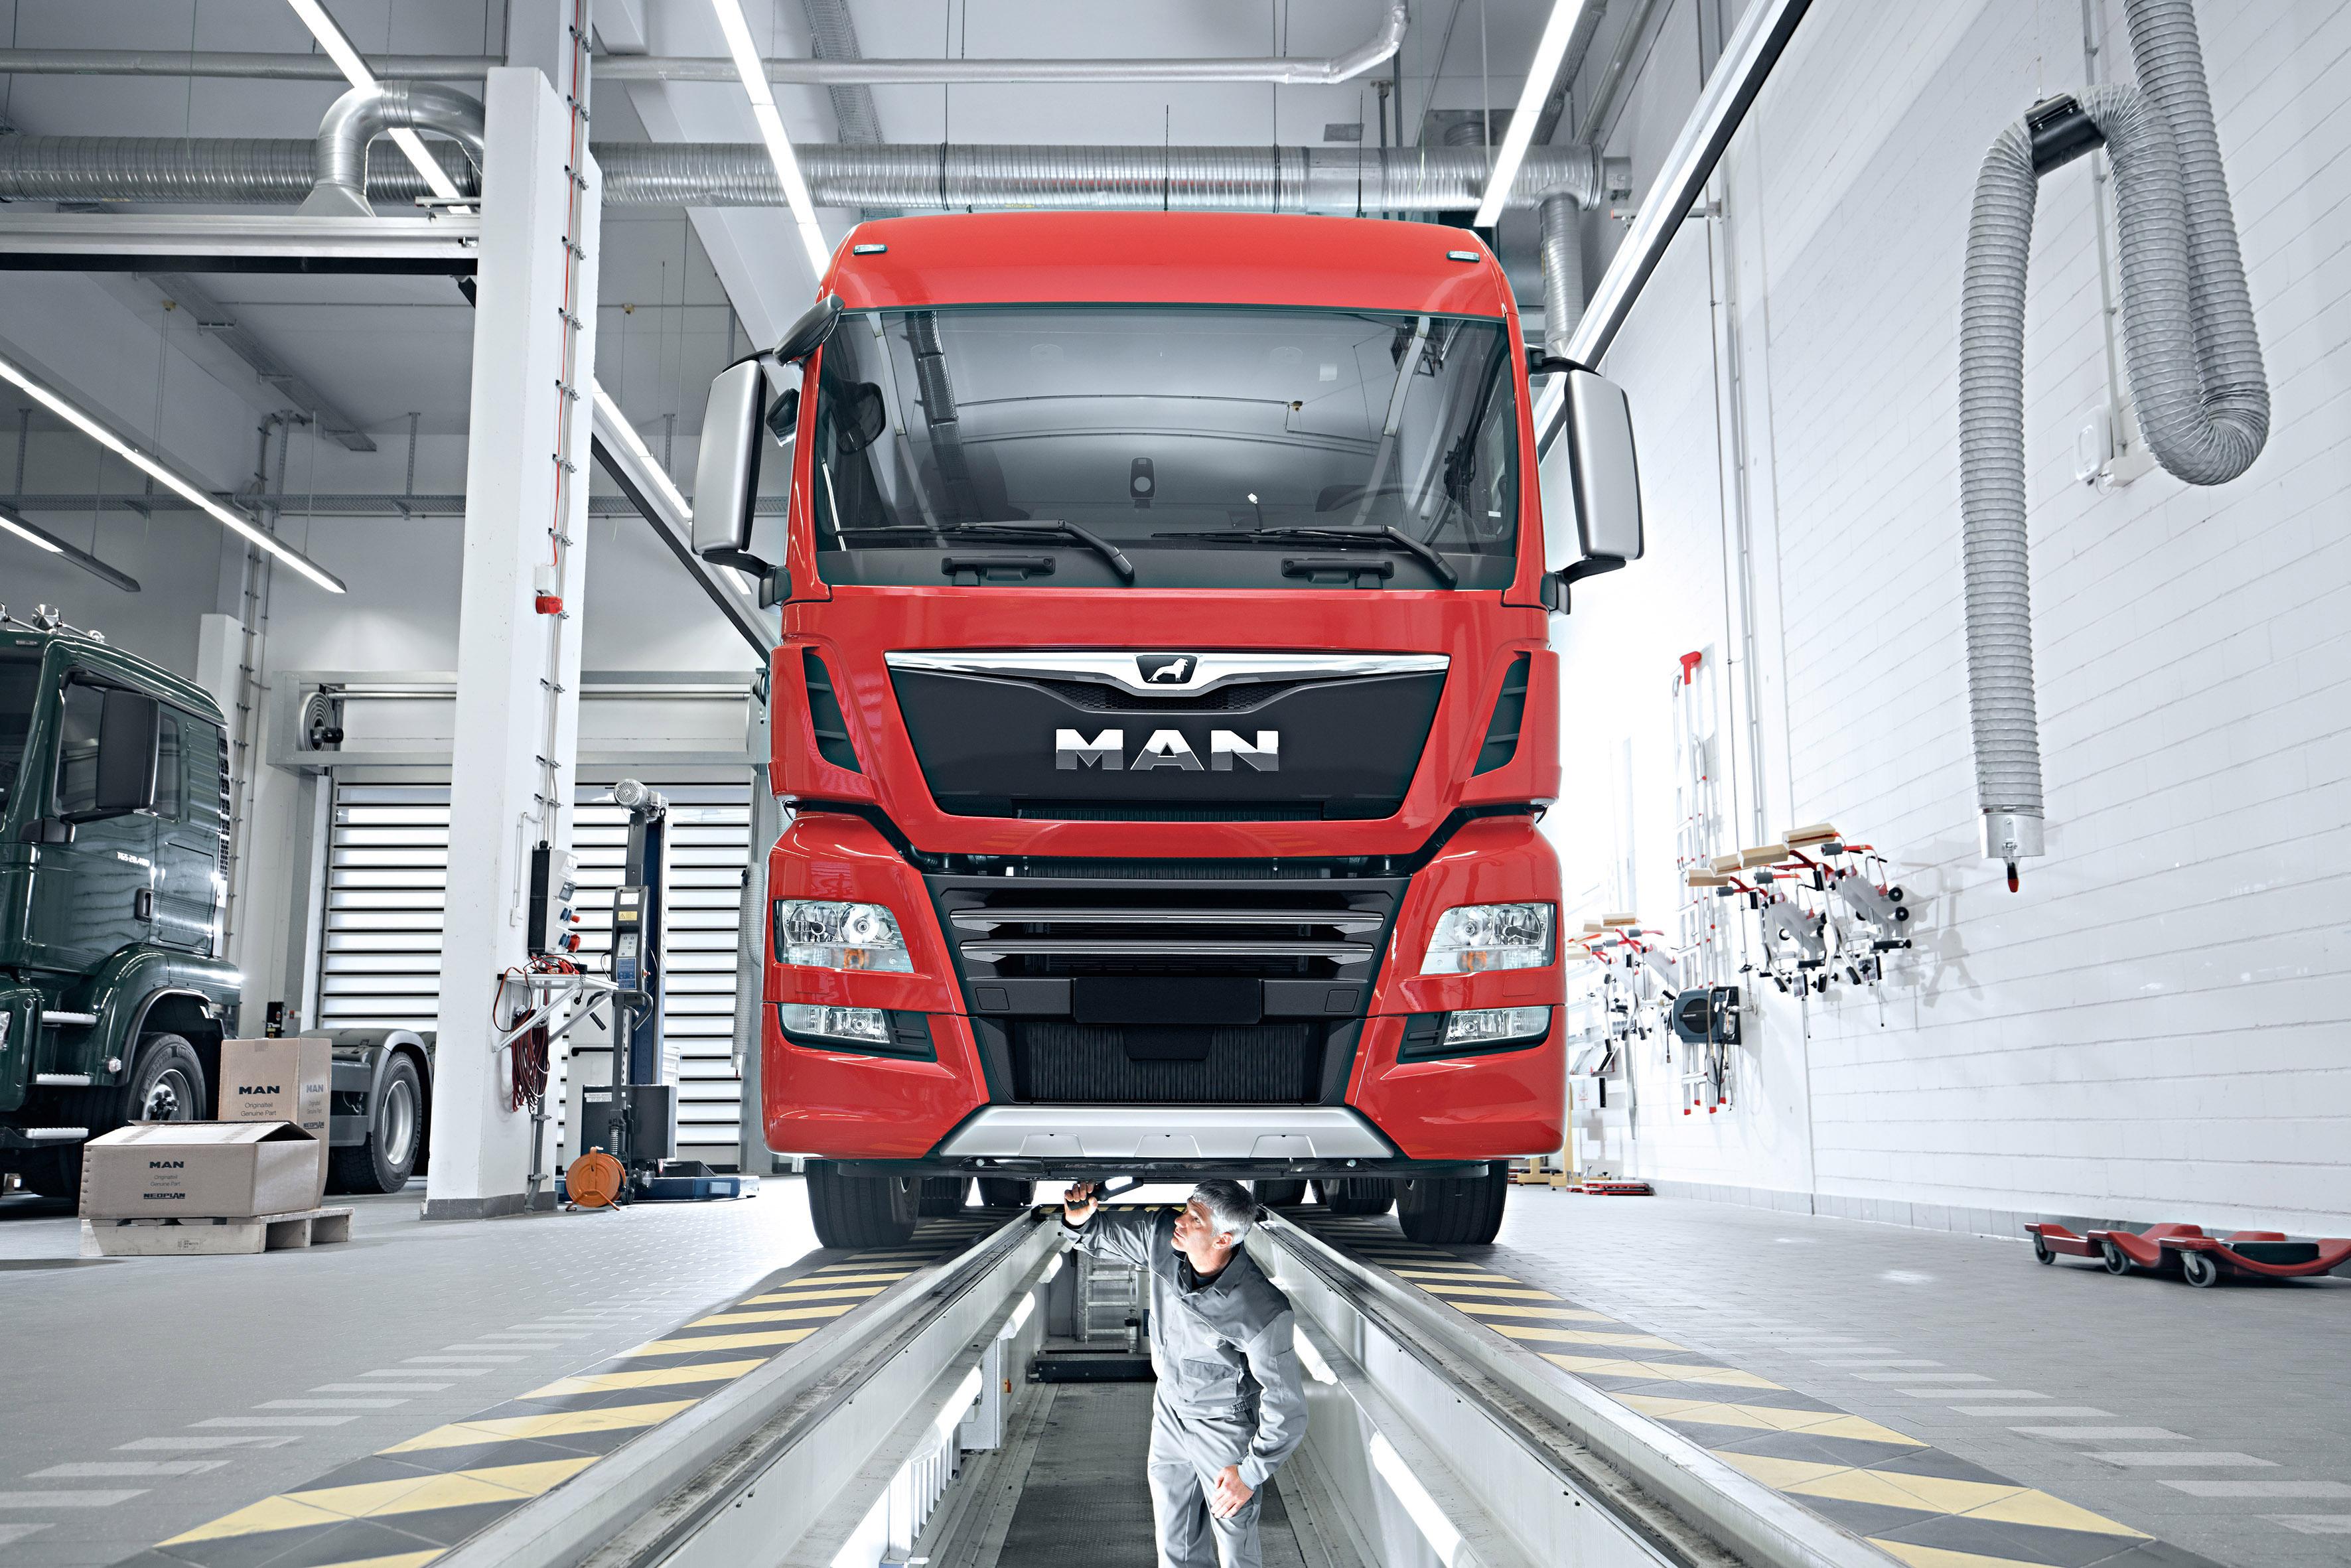 Картинки грузового сервиса